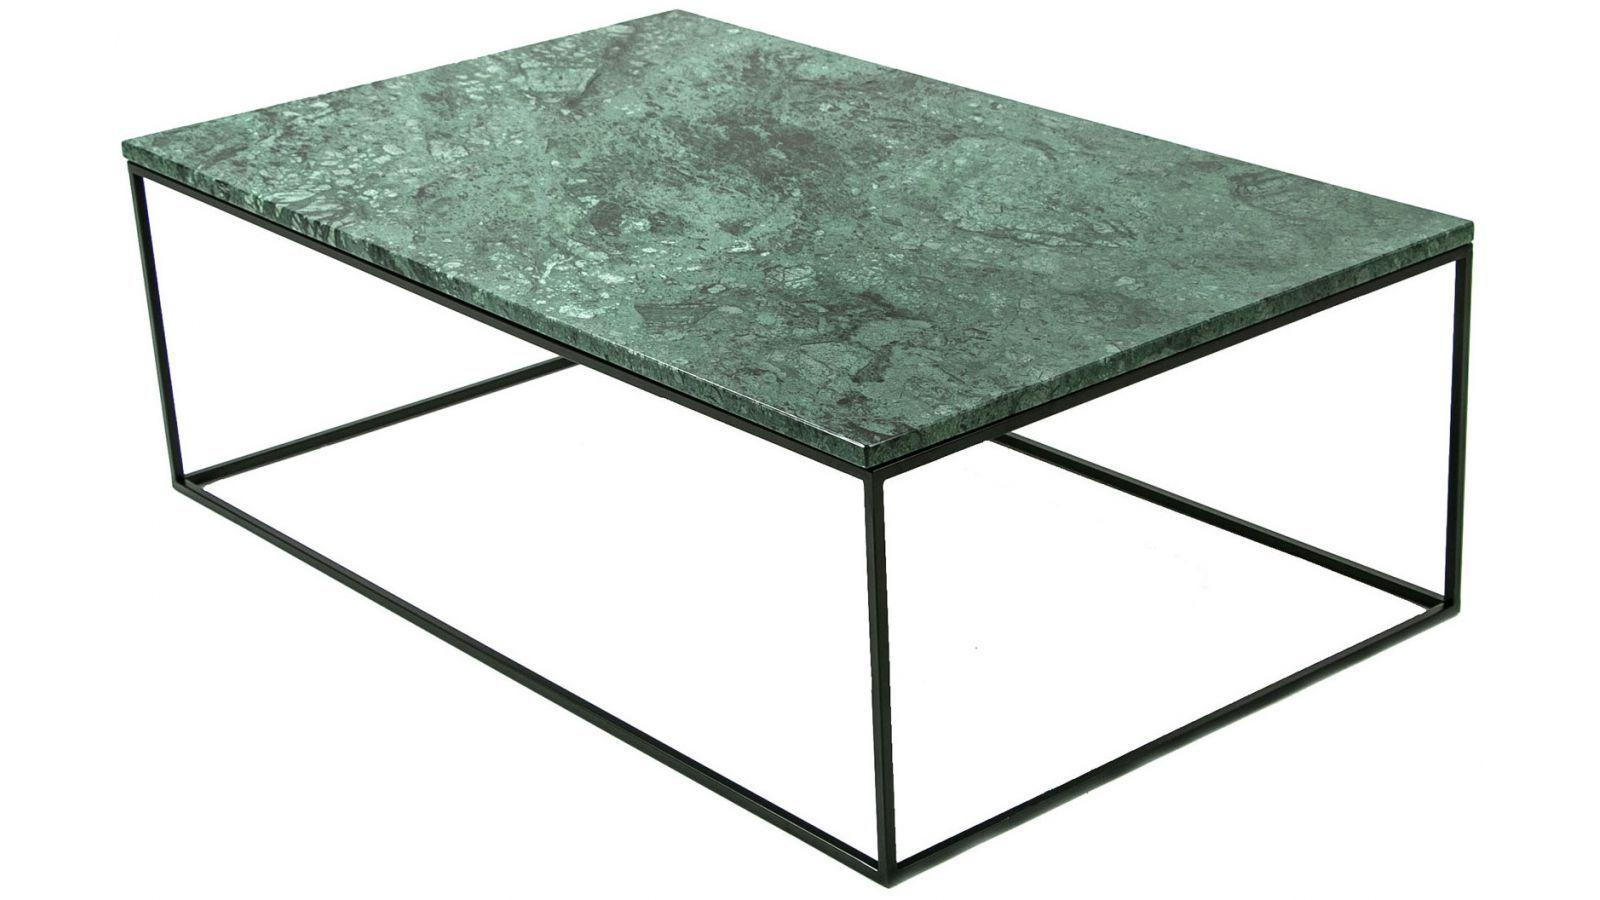 Pin tillagd av Sweef Furniture på Sweef se Product Images Soffbord marmor, Soffbord och